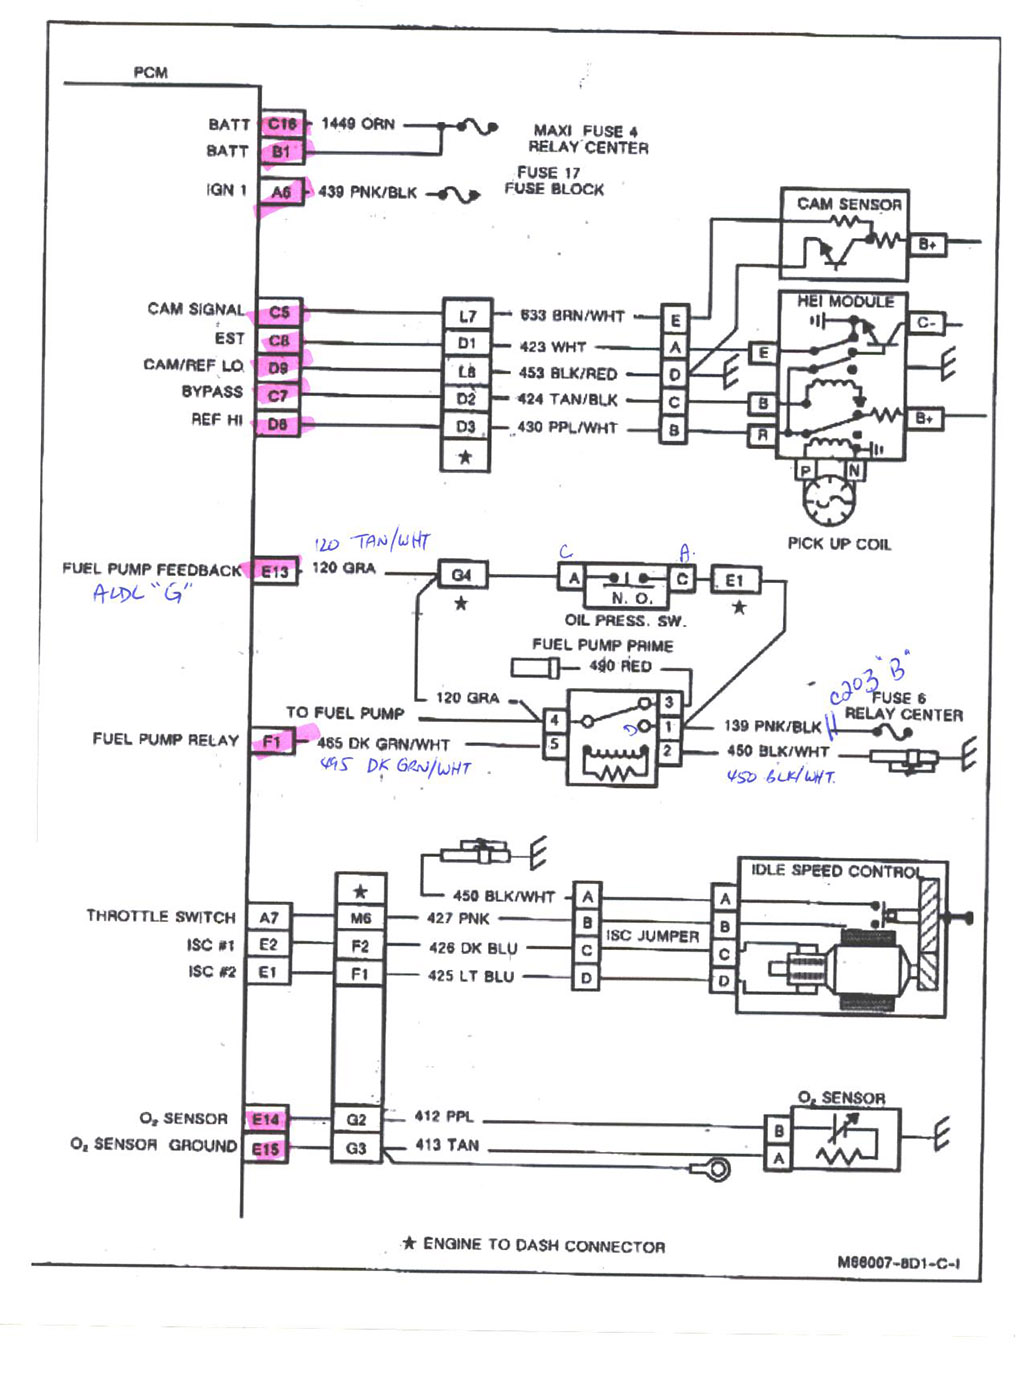 Need A Vacuum Line Diagram For A 93 Dodge Caravan Es 33 Engine